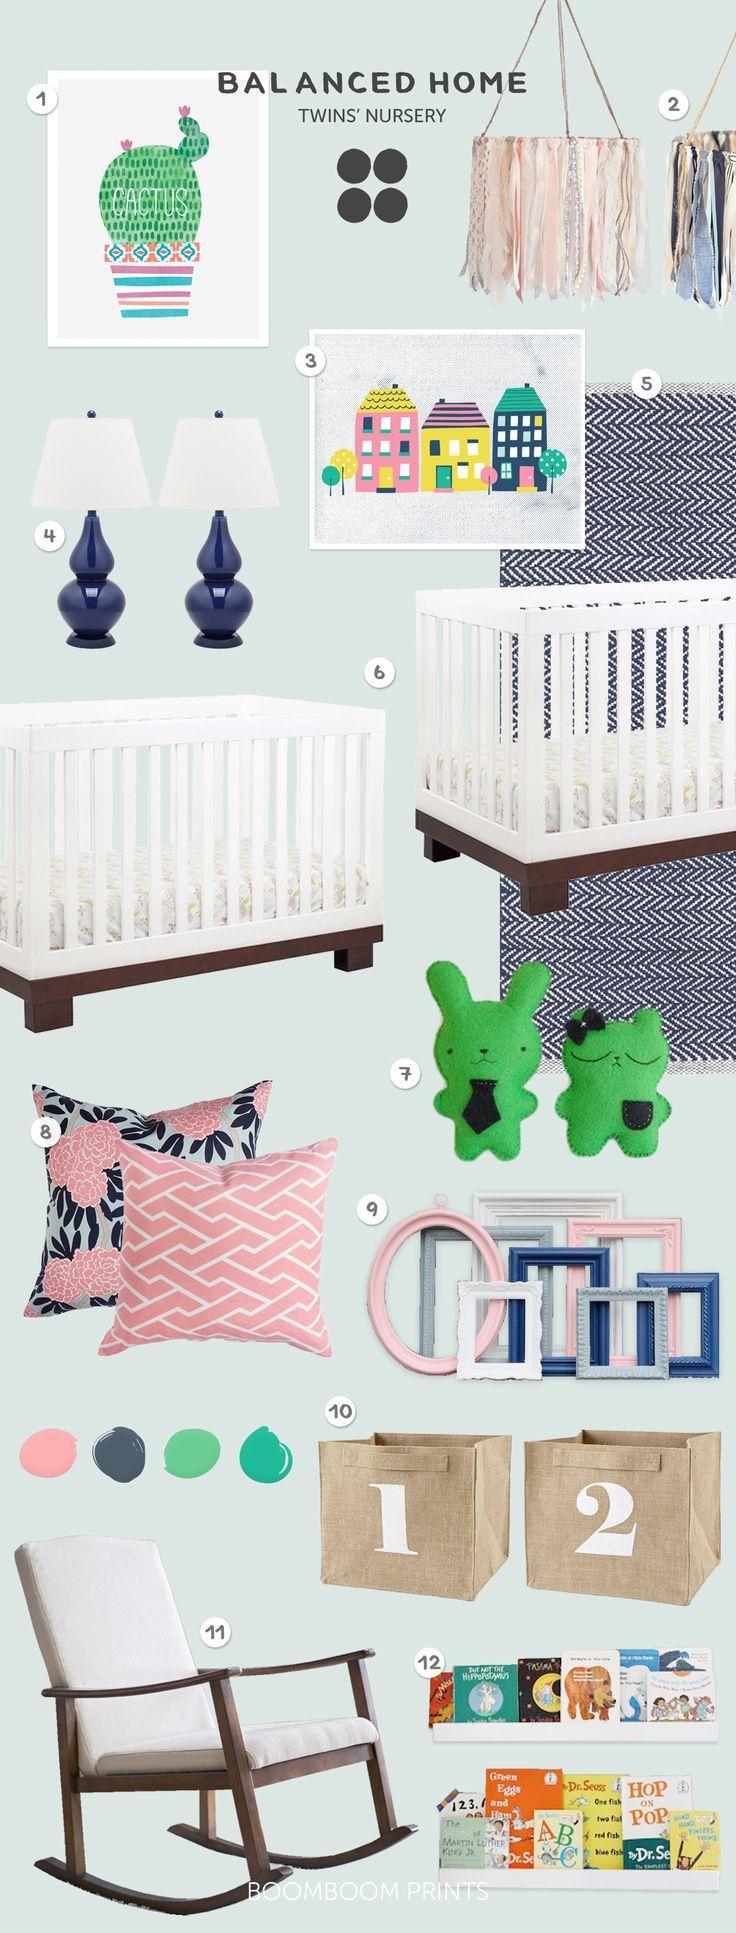 Best 25+ Small twin nursery ideas on Pinterest | Small baby ...